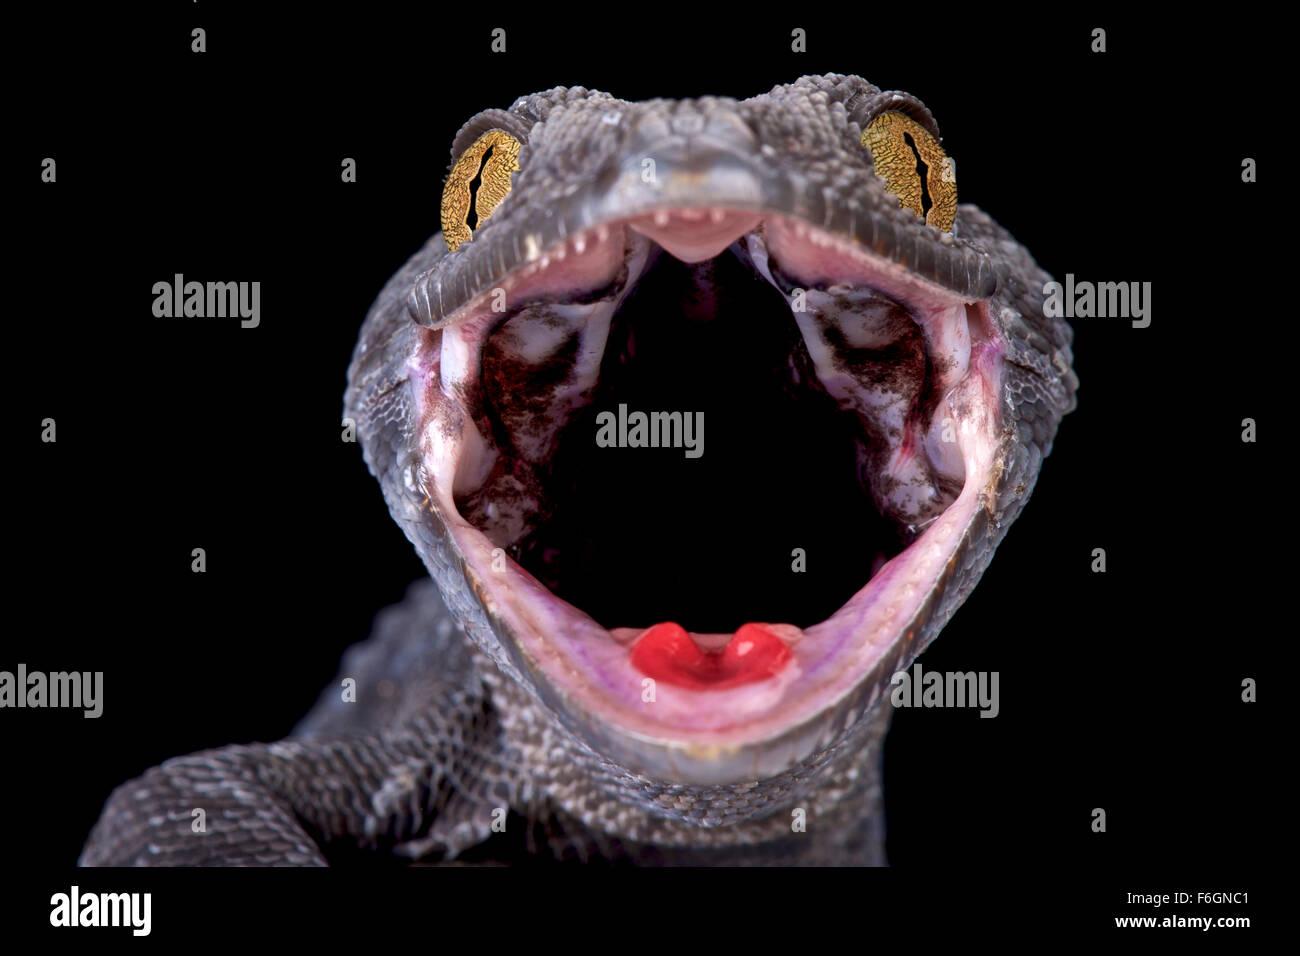 Tokeh (Gekko gecko) - Stock Image